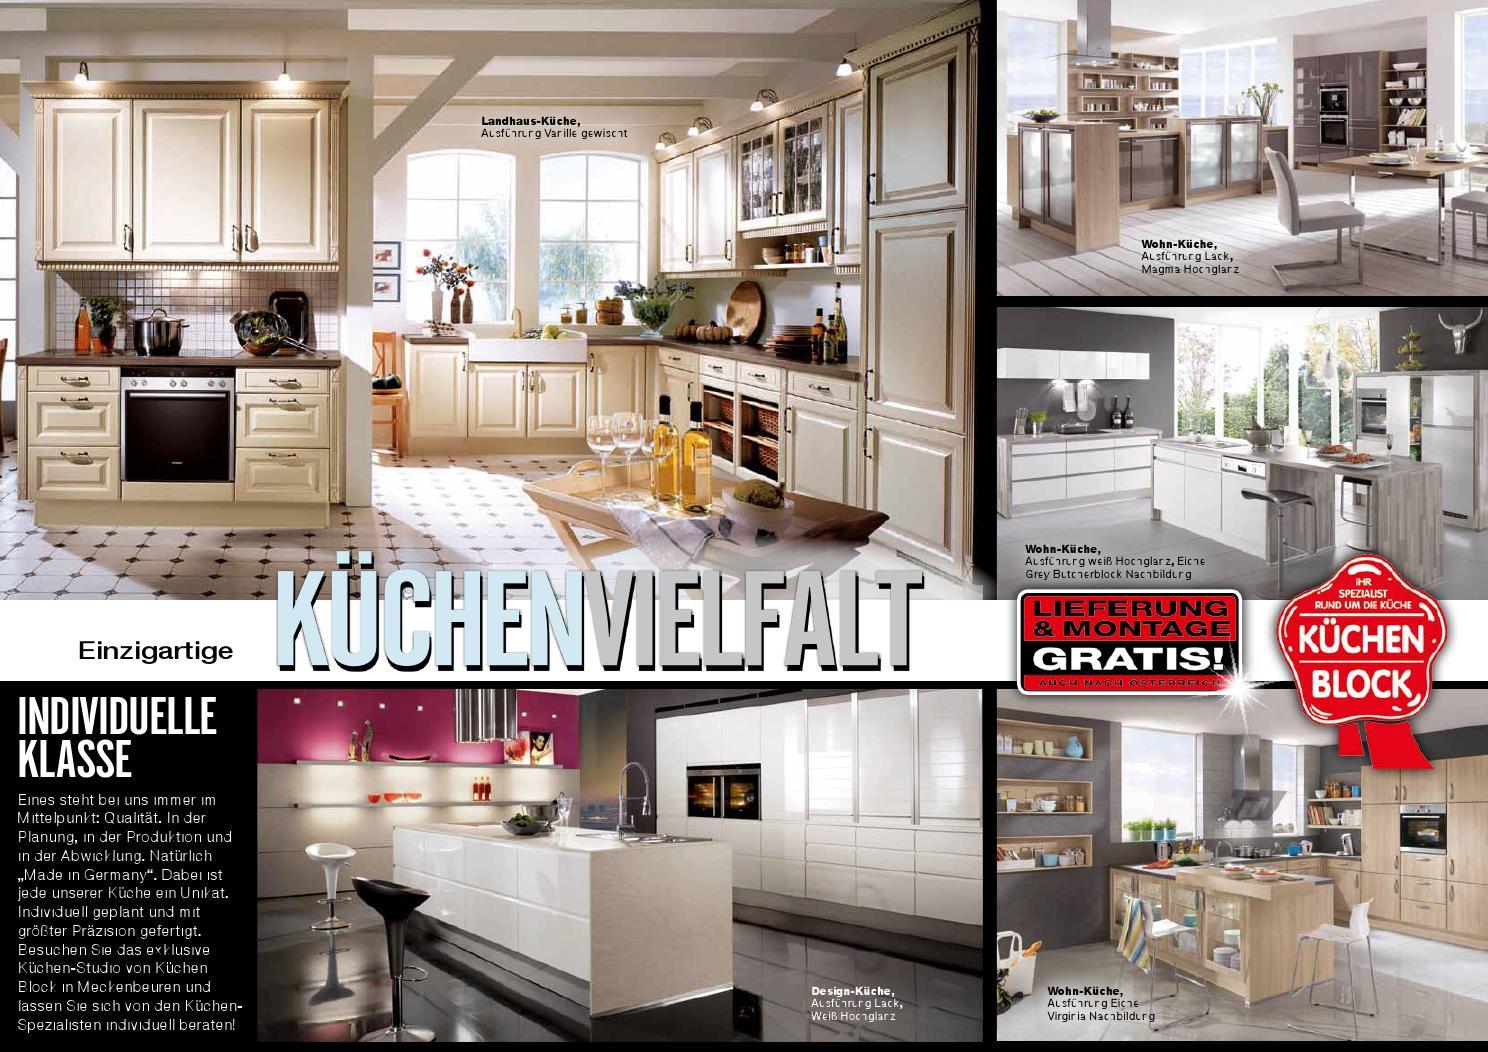 Perfekt Moebel Block Kw4 By Russmedia Digital GmbH   Issuu